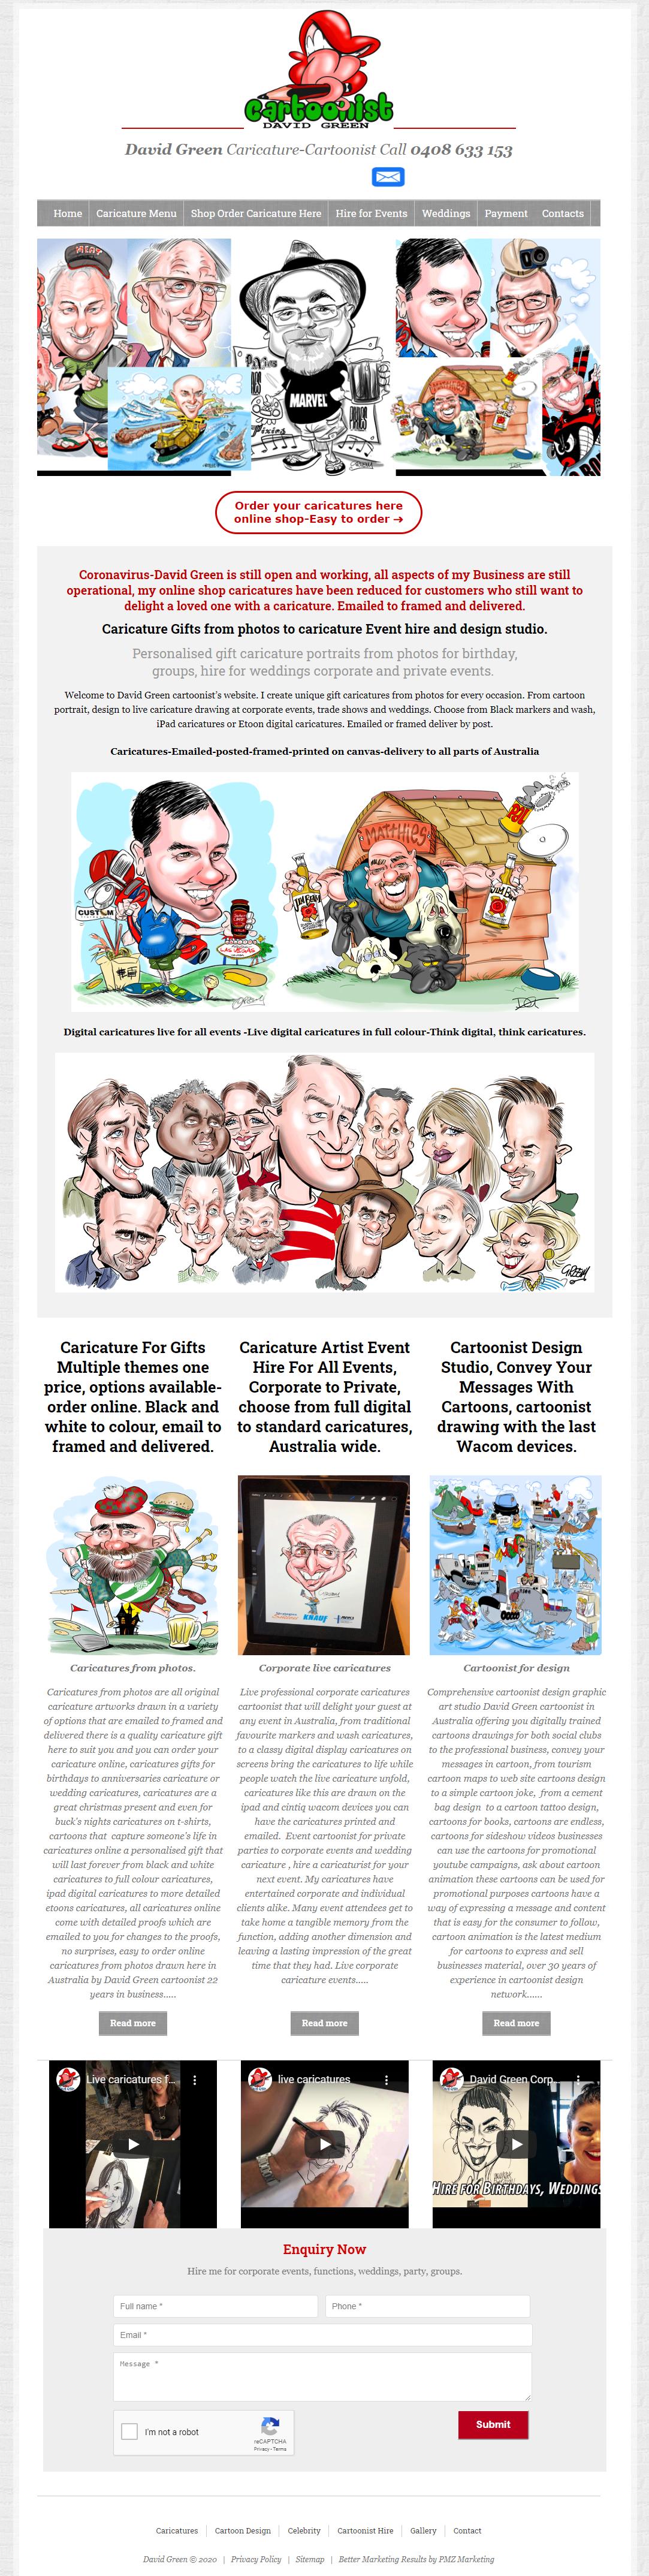 David Green Caricatures :: PMZ Marketing Client